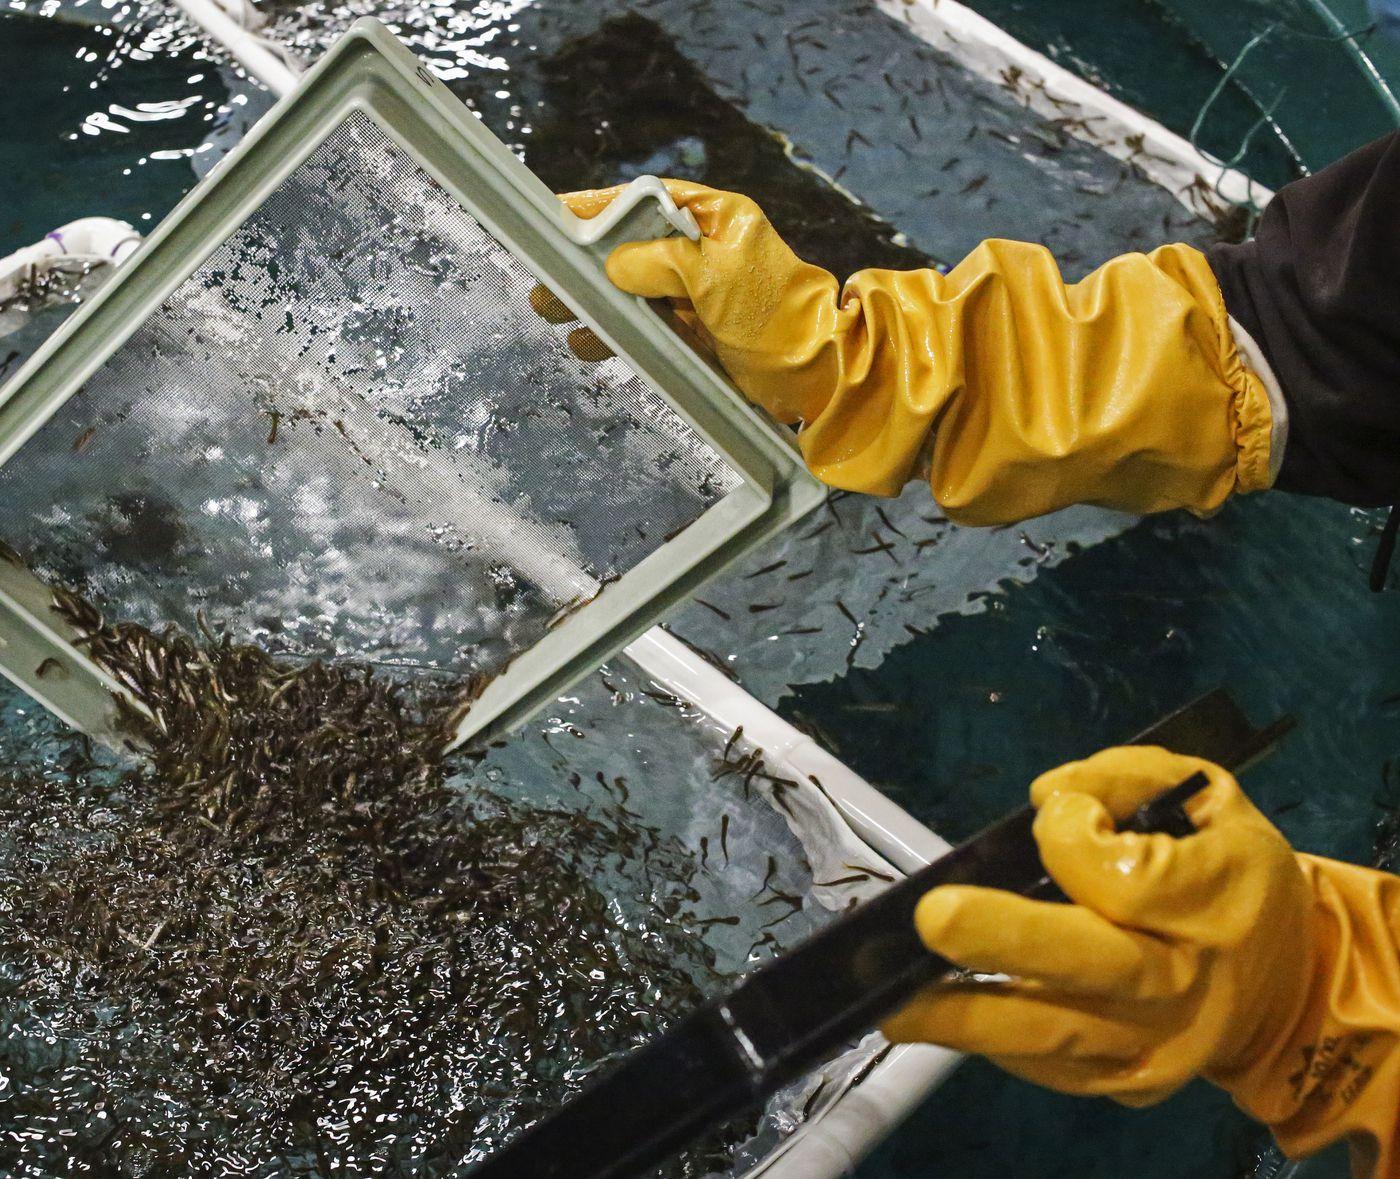 Scott Cunfer transfers trays of salmon fry into net baskets in November. (Emily Mesner / ADN)